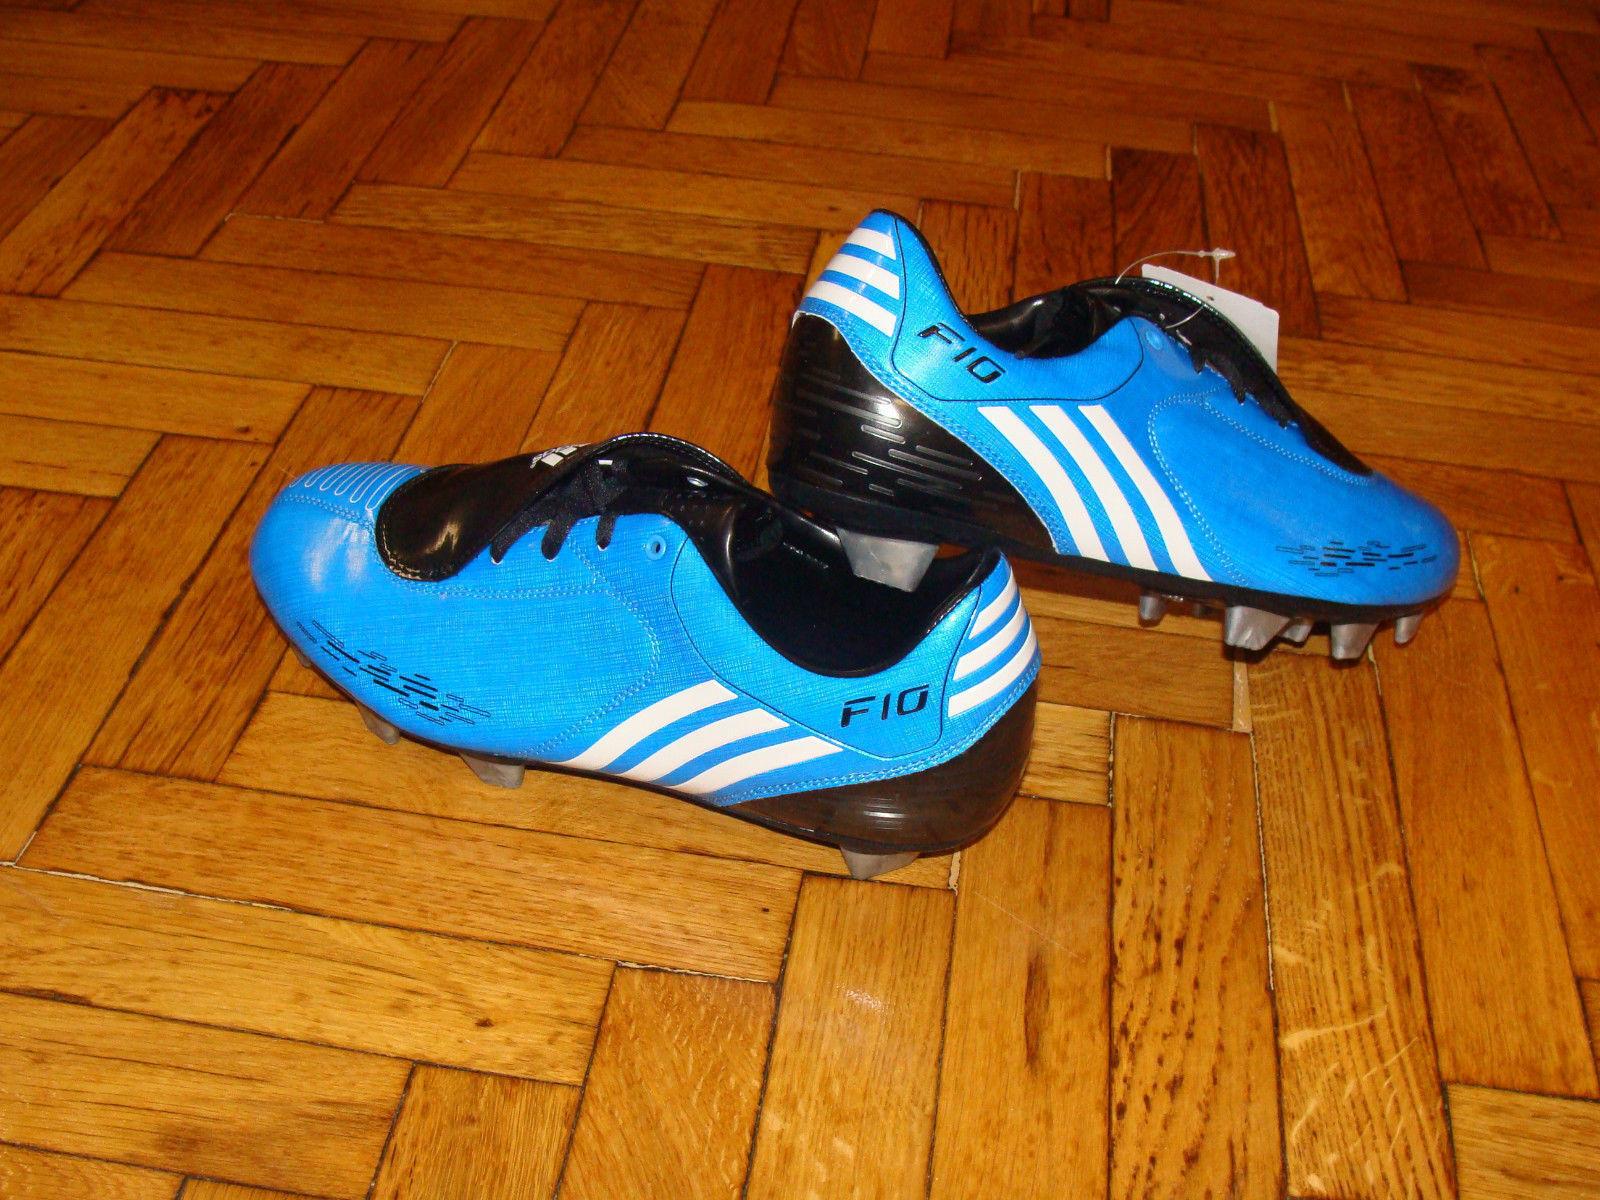 Adidas F10 Soccer stivali F 10 Football Soft Ground scarpe blu NEW